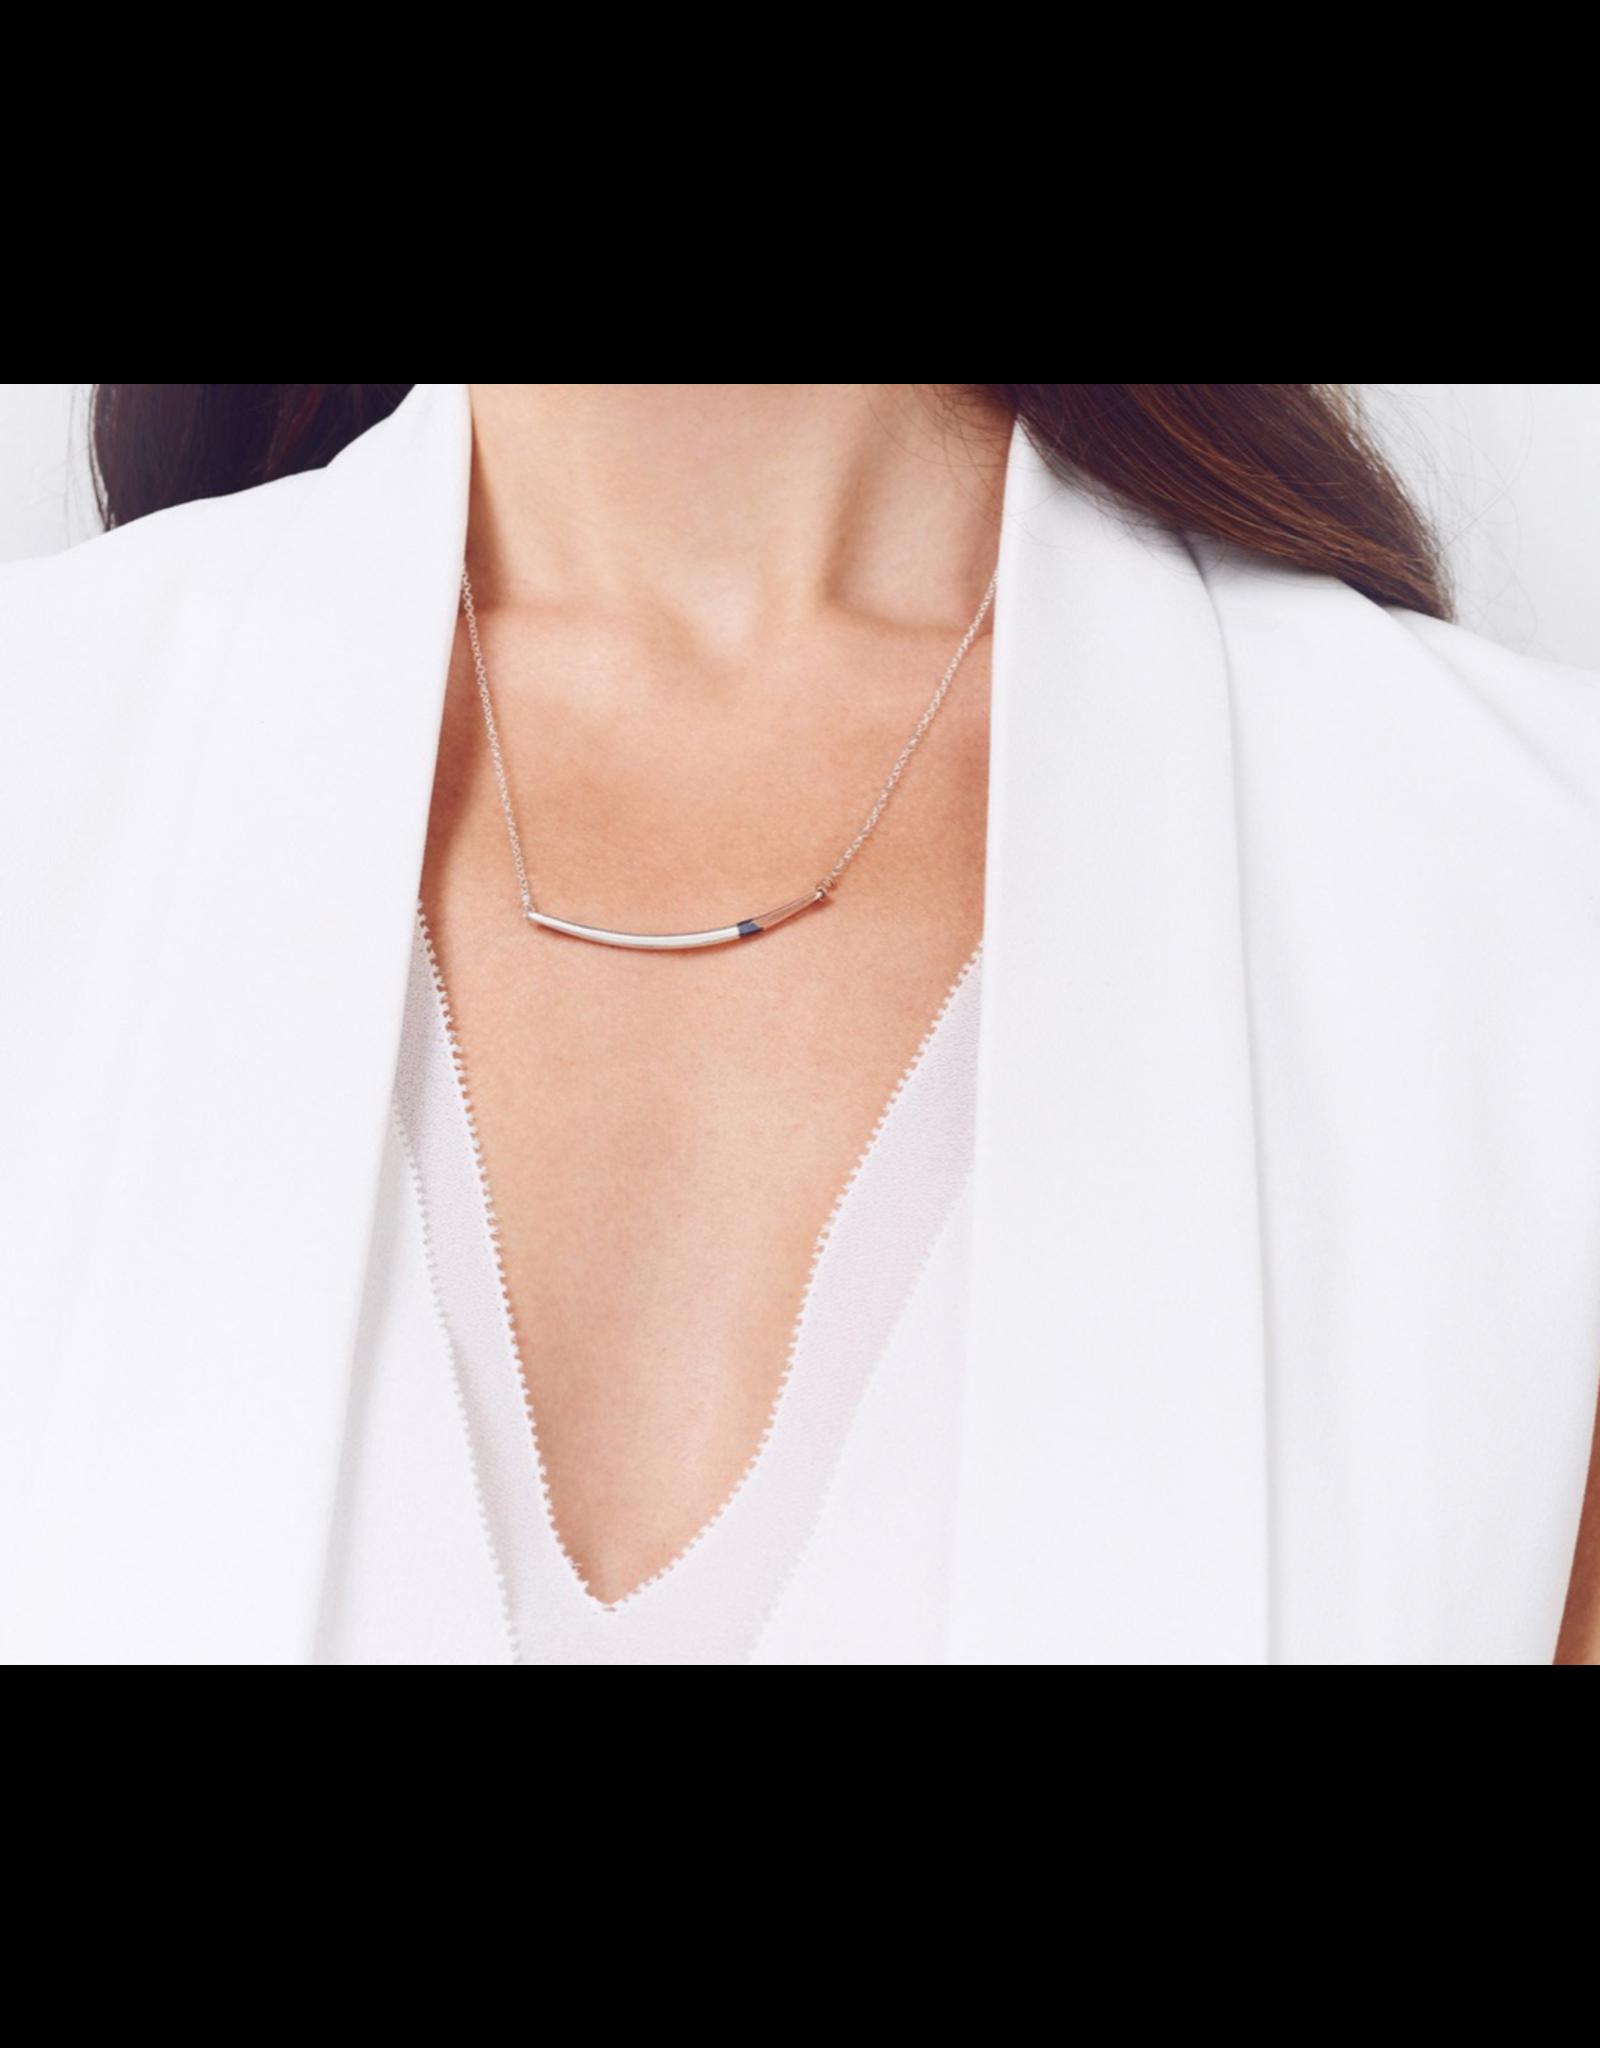 Colleen Mauer Mini Tri-toned Arc Necklace